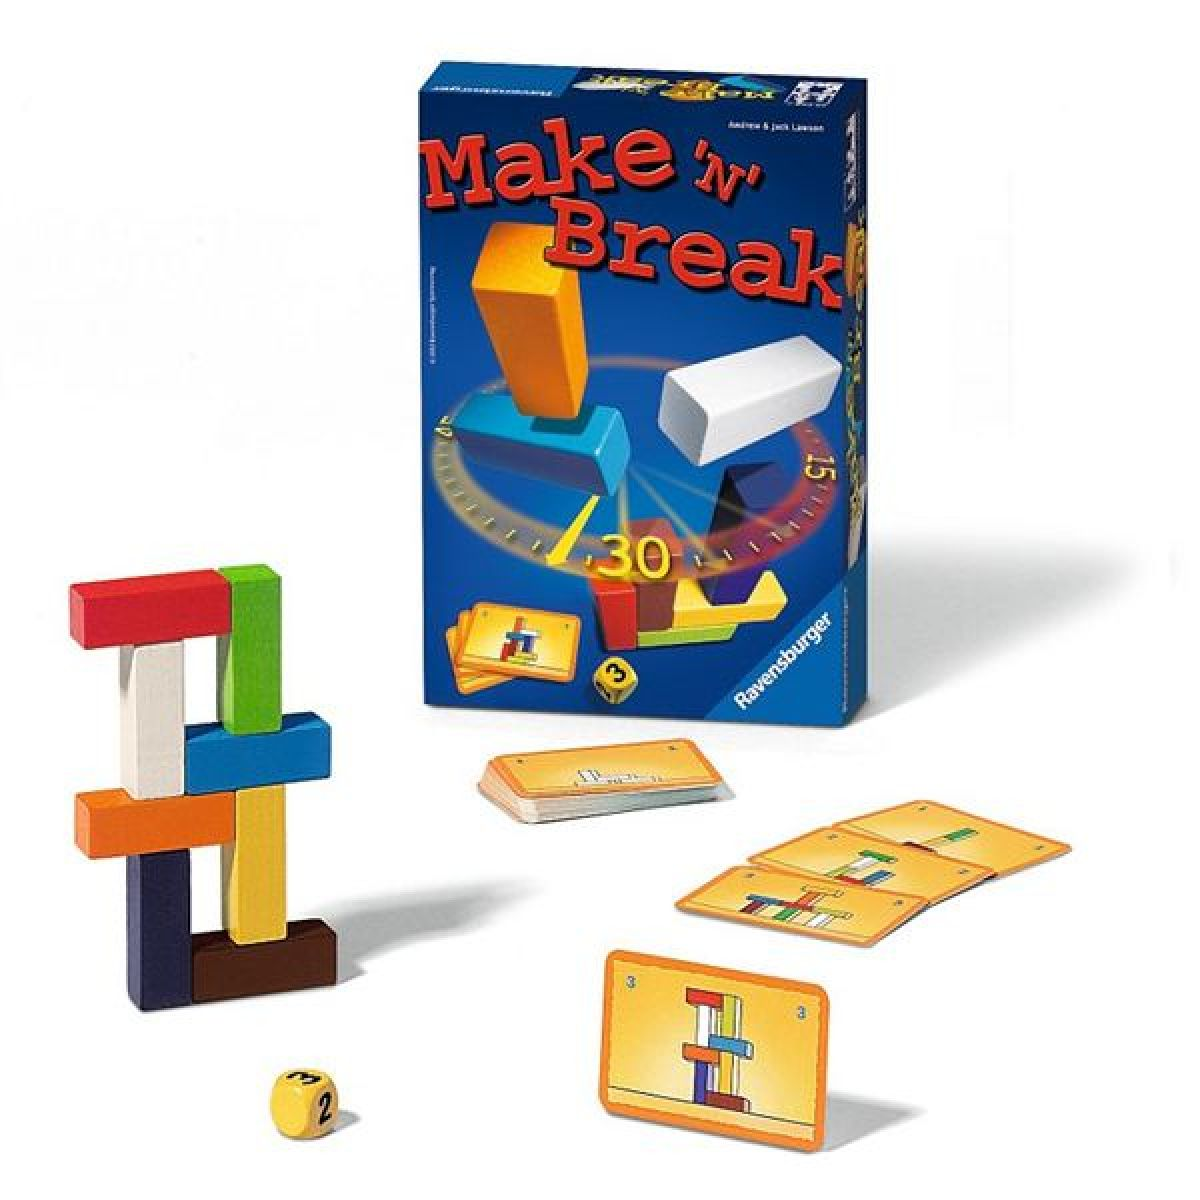 Ravensburger Make and Break: Compact